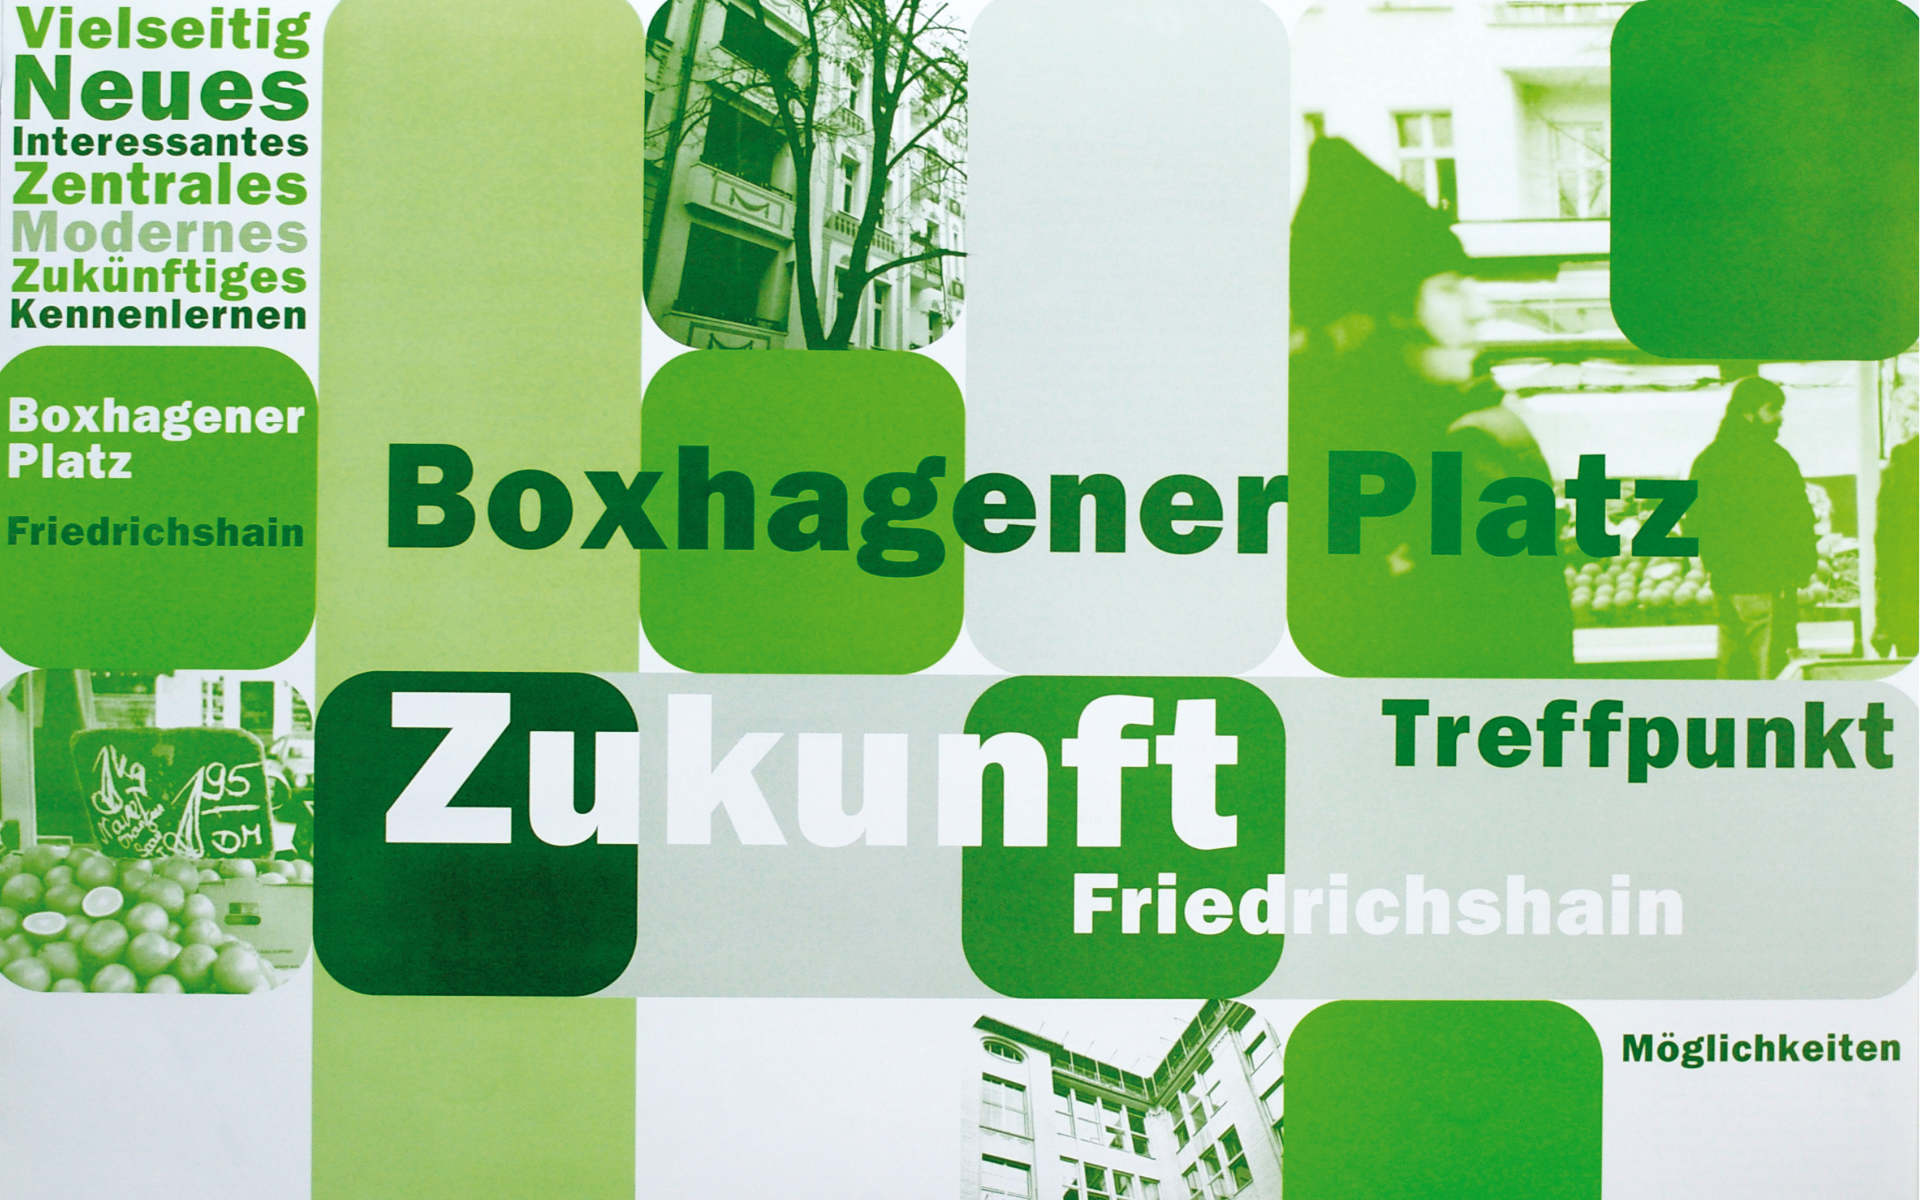 Boxhagenerplatz Quartiersmanagement Plakatgestaltung Plakat